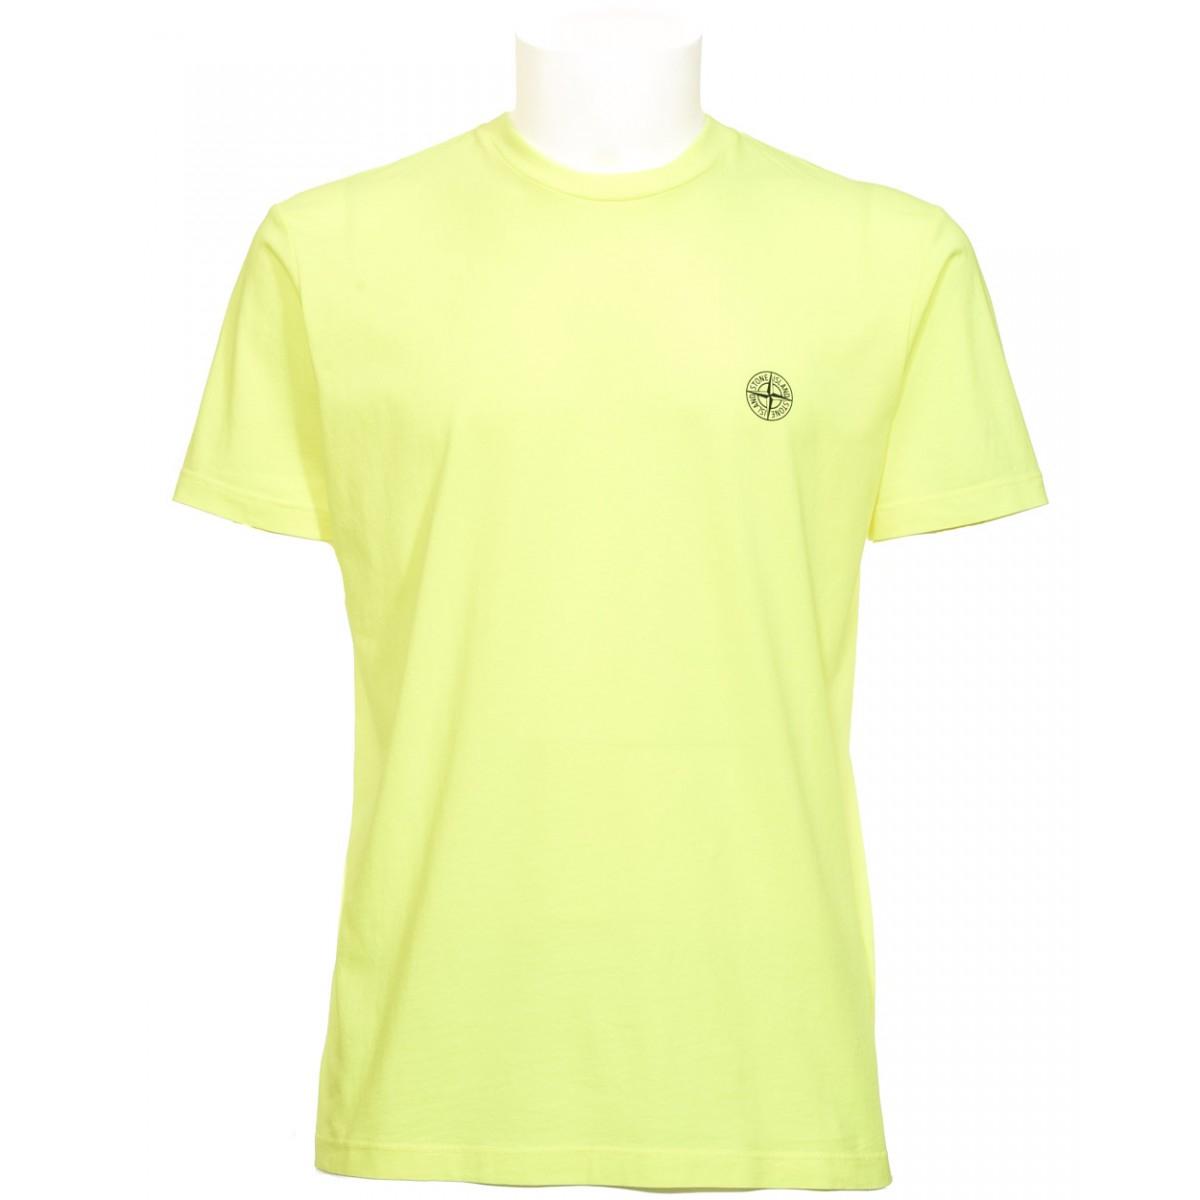 Stone Island Neon Yellow Printed T Shirt In Yellow Lyst